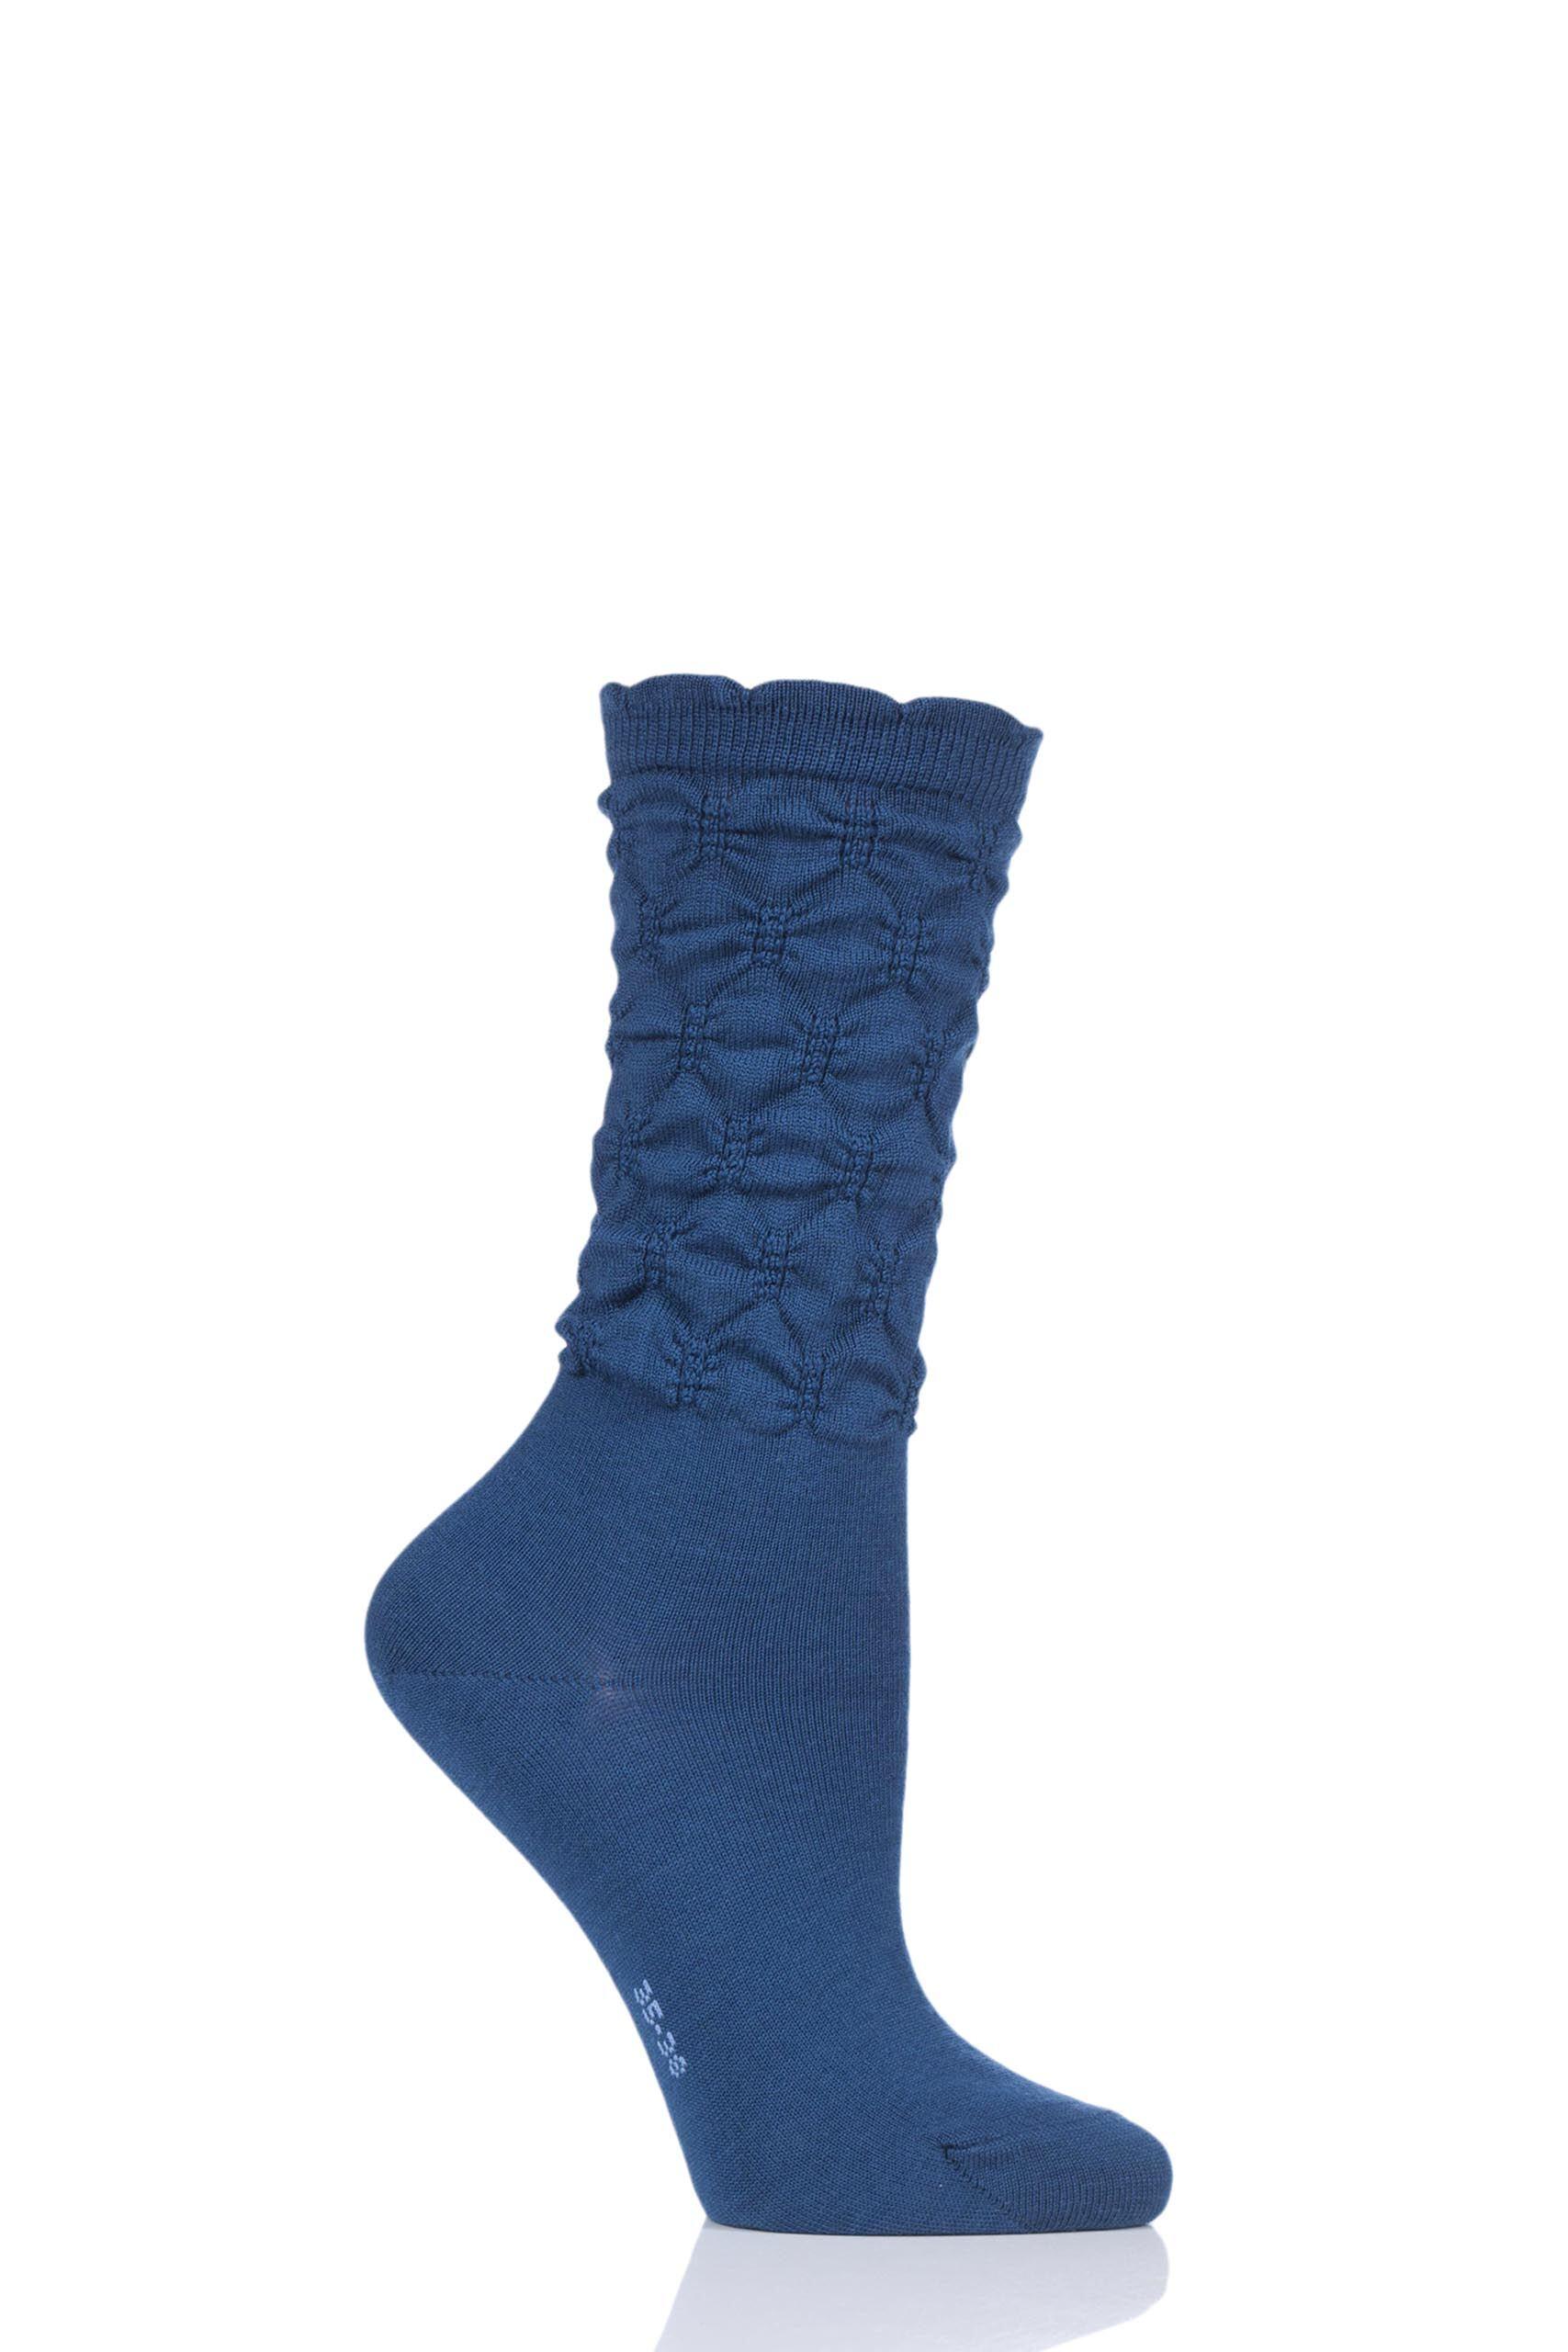 1 pair night sky crumpled diamond rib virgin wool socks ladies 5.5-8 ladies - falke